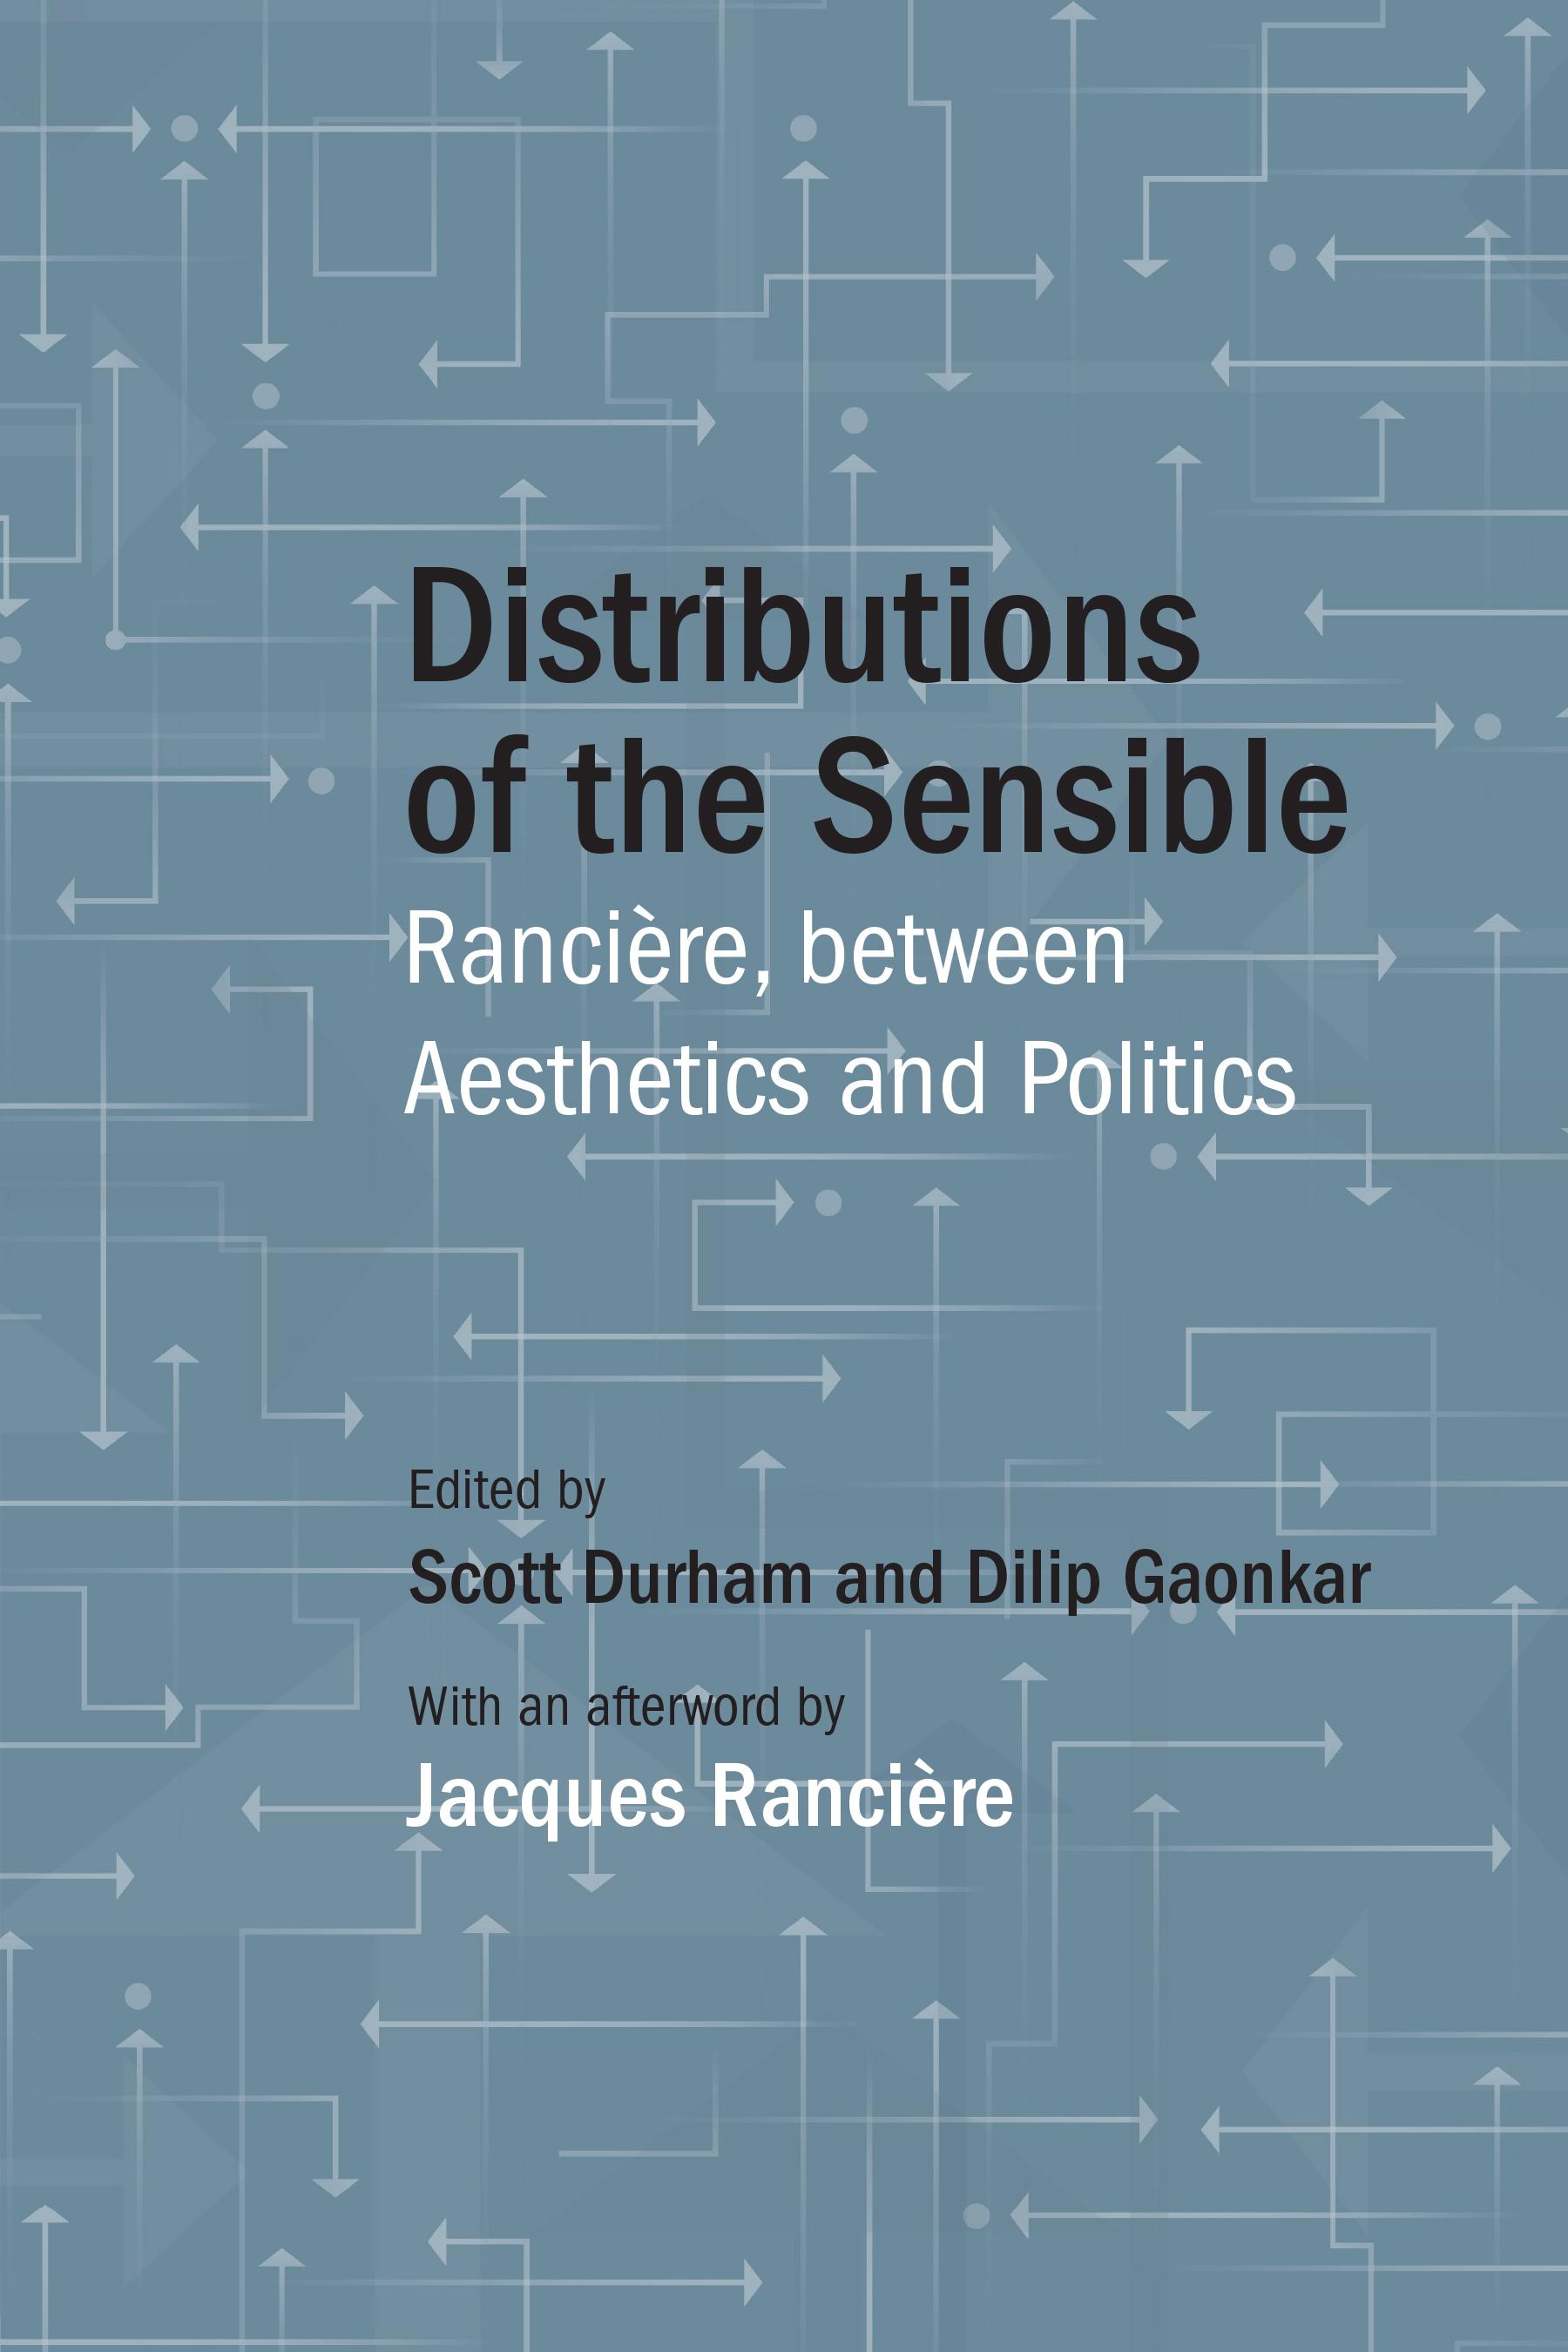 Distributions of the Sensible: Rancière, between Aesthetics and Politics